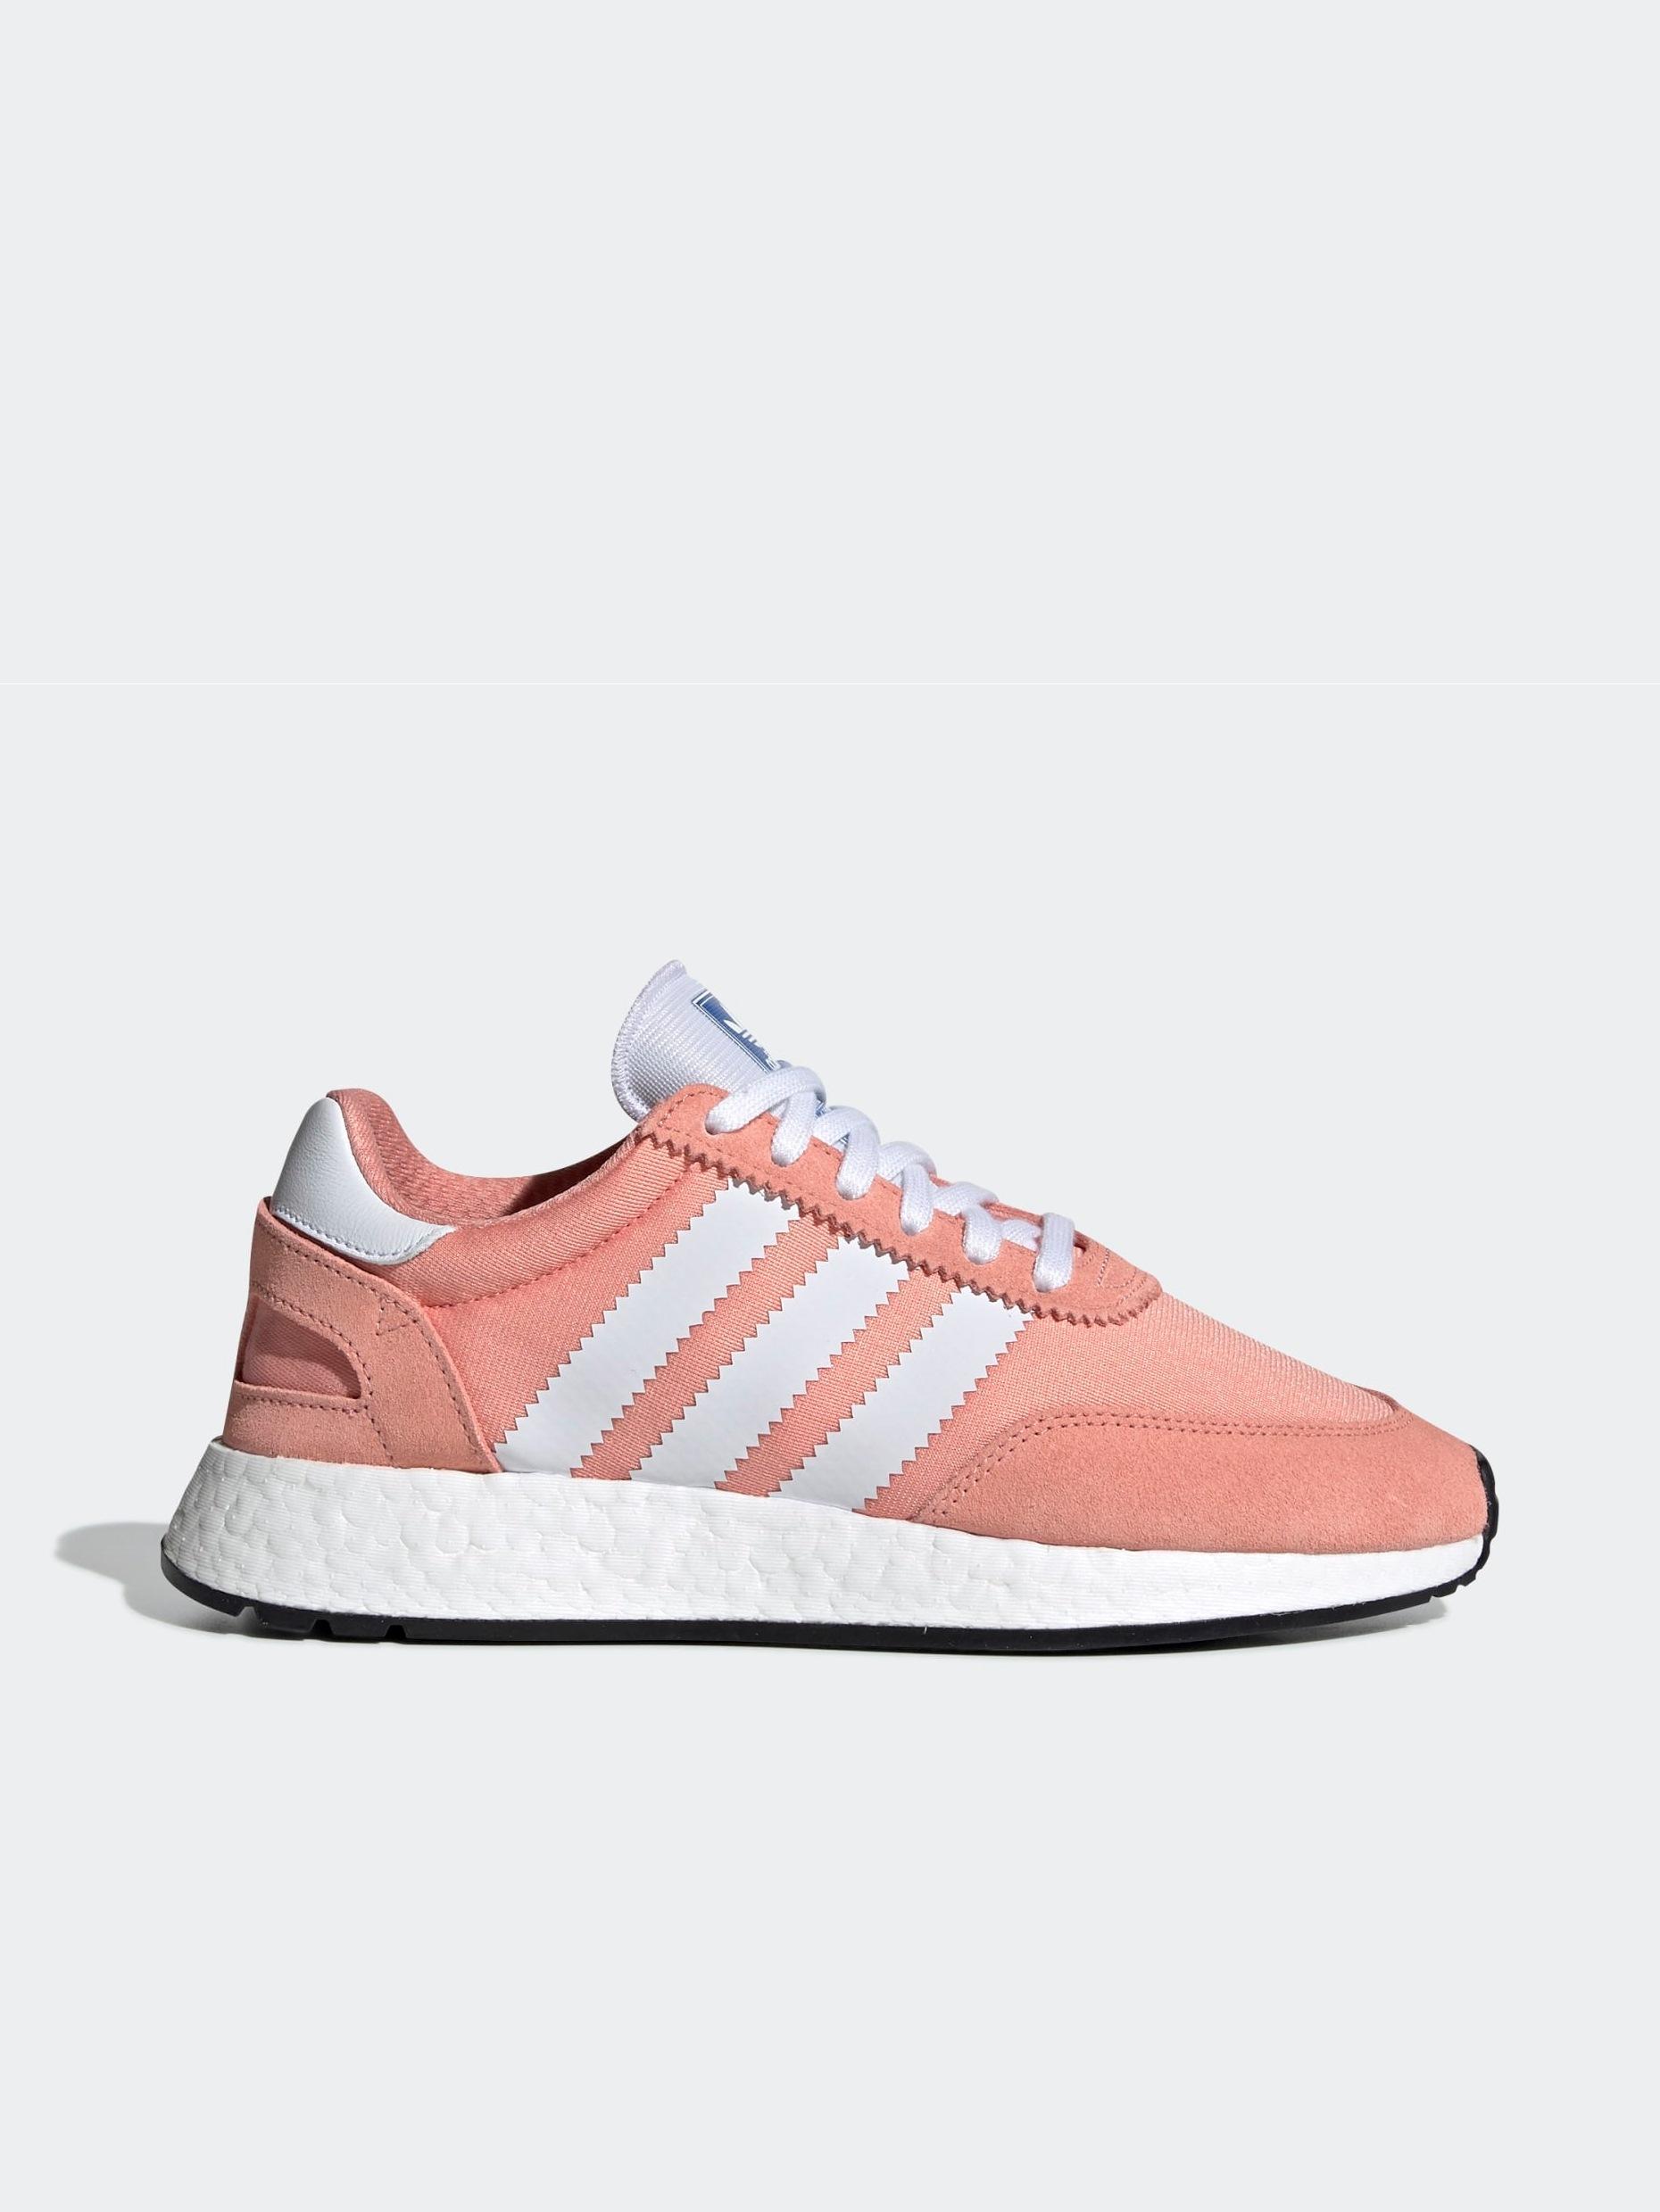 Кроссовки I-5923 Pink/White Adidas CG6037  Розовый Free Style